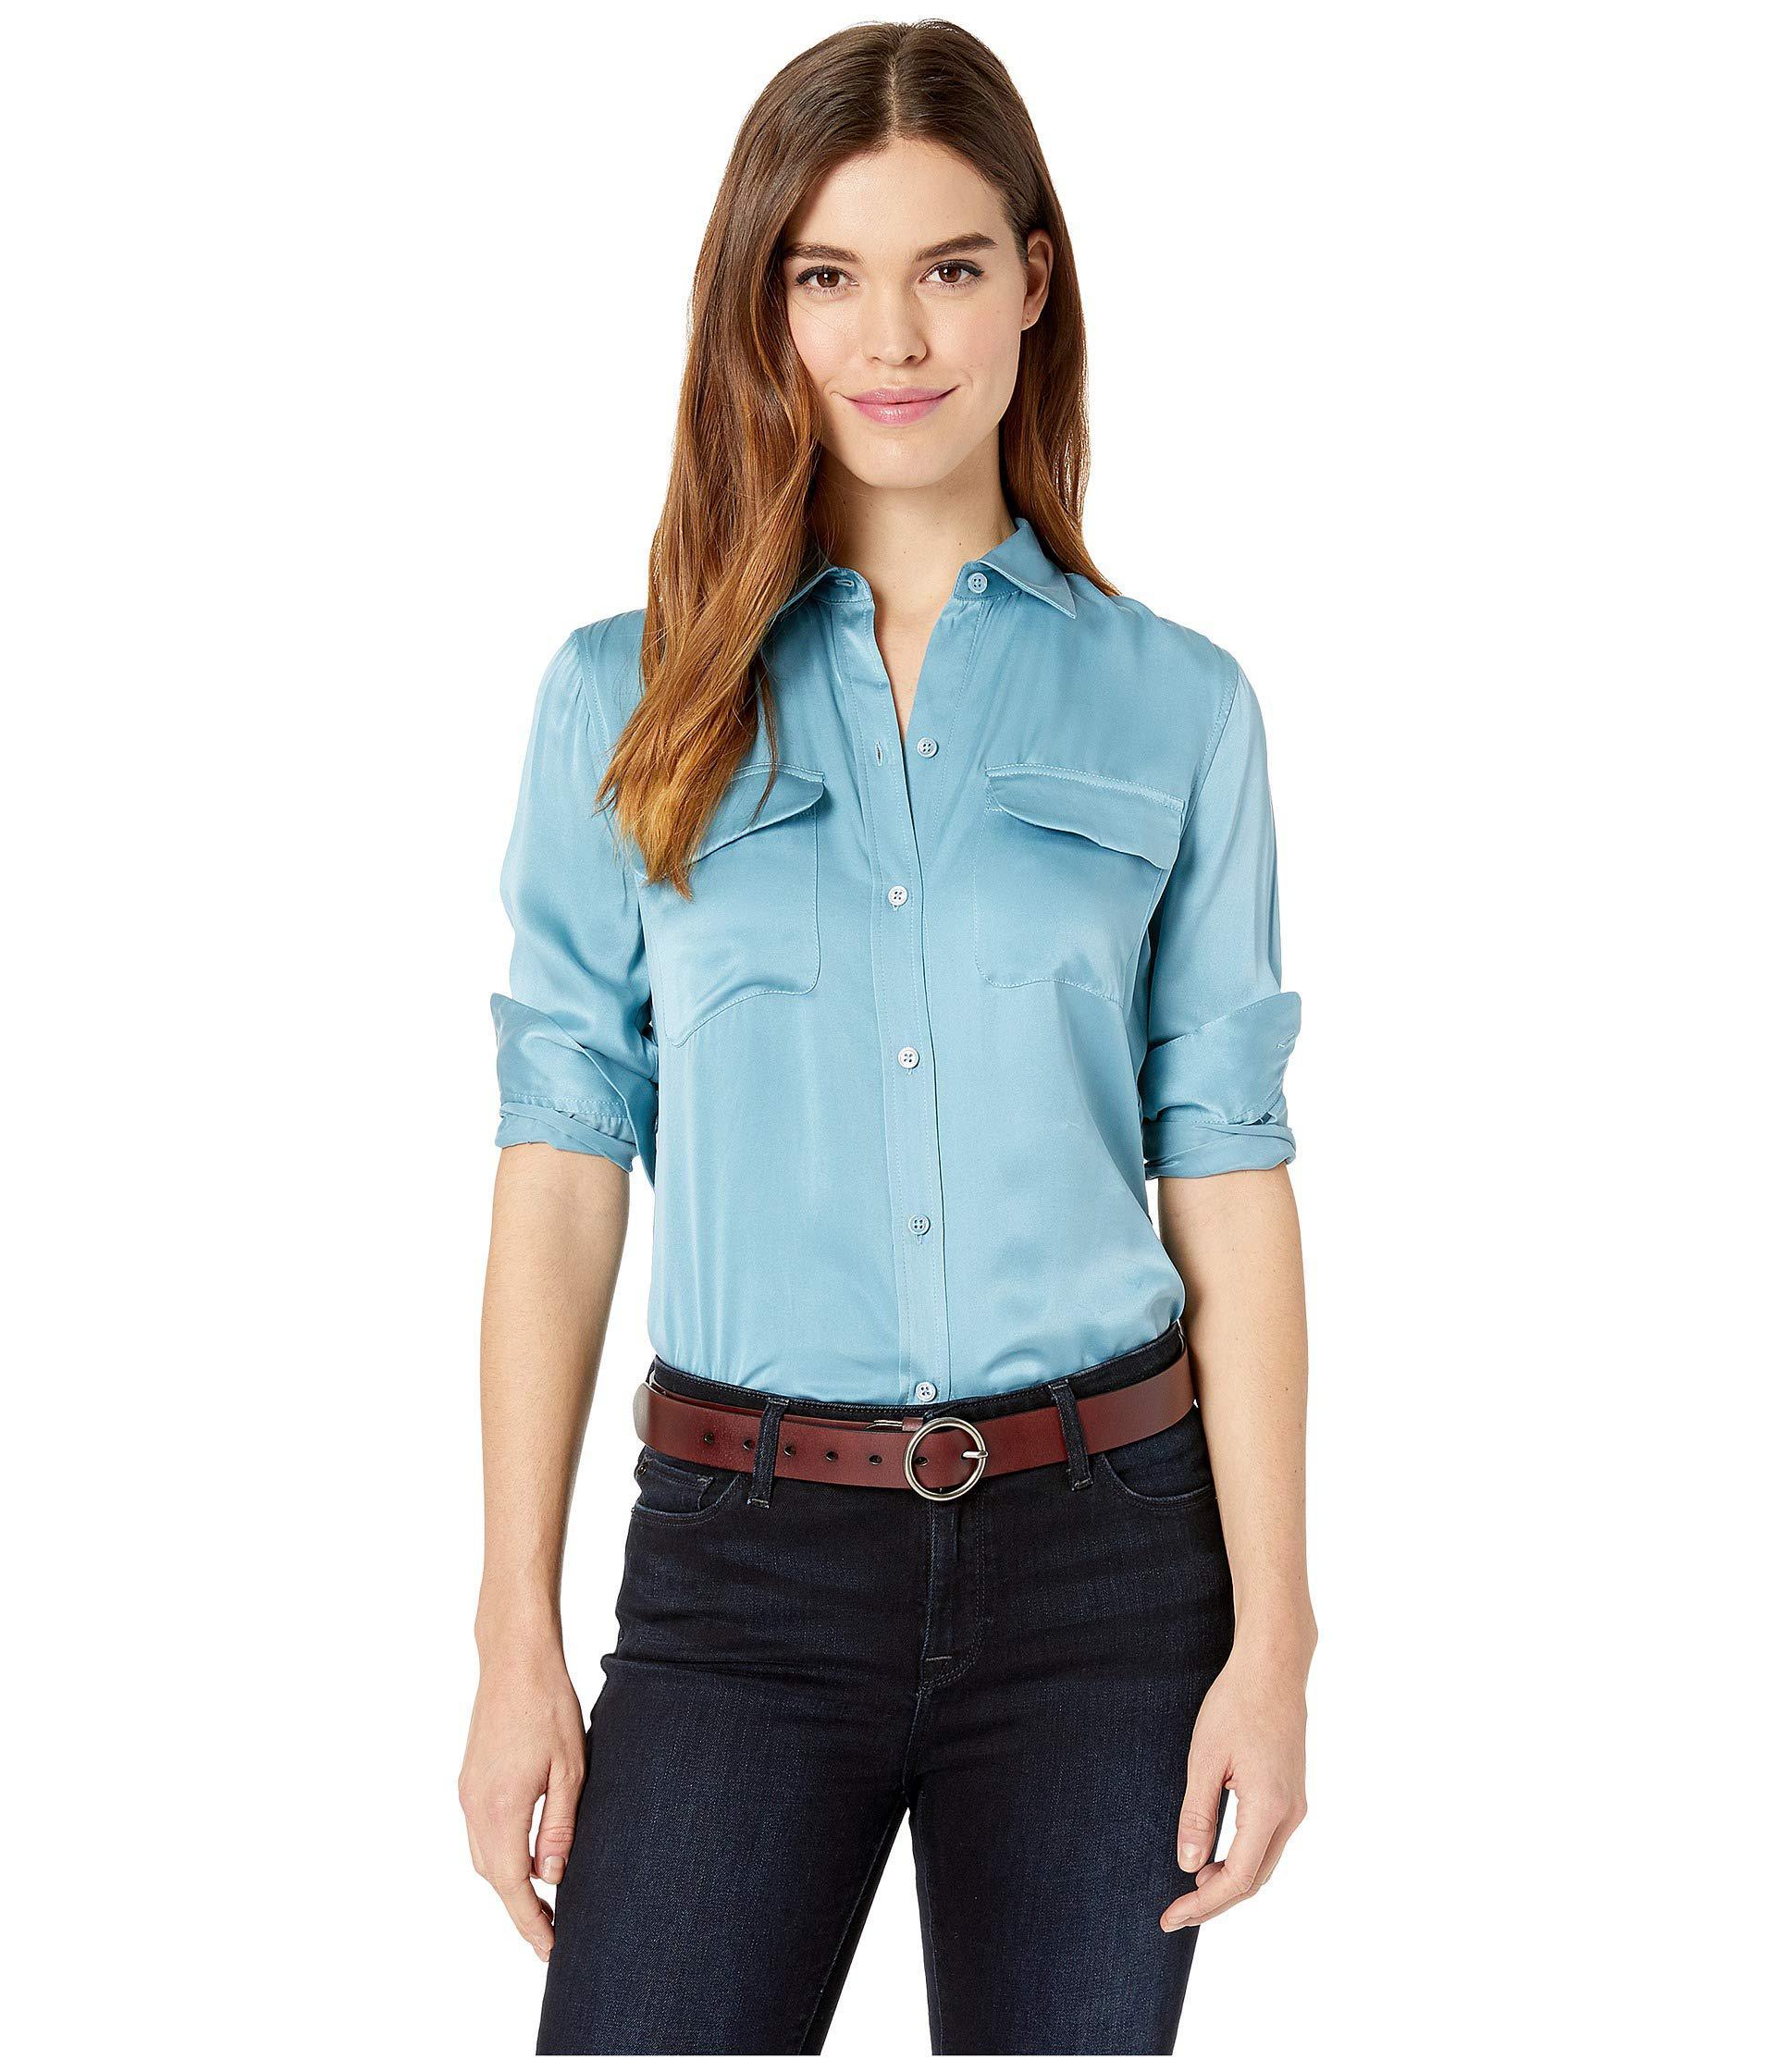 308384a15f6c8 Lyst - Equipment Slim Signature Top (bleu Fume) Women s Long Sleeve ...